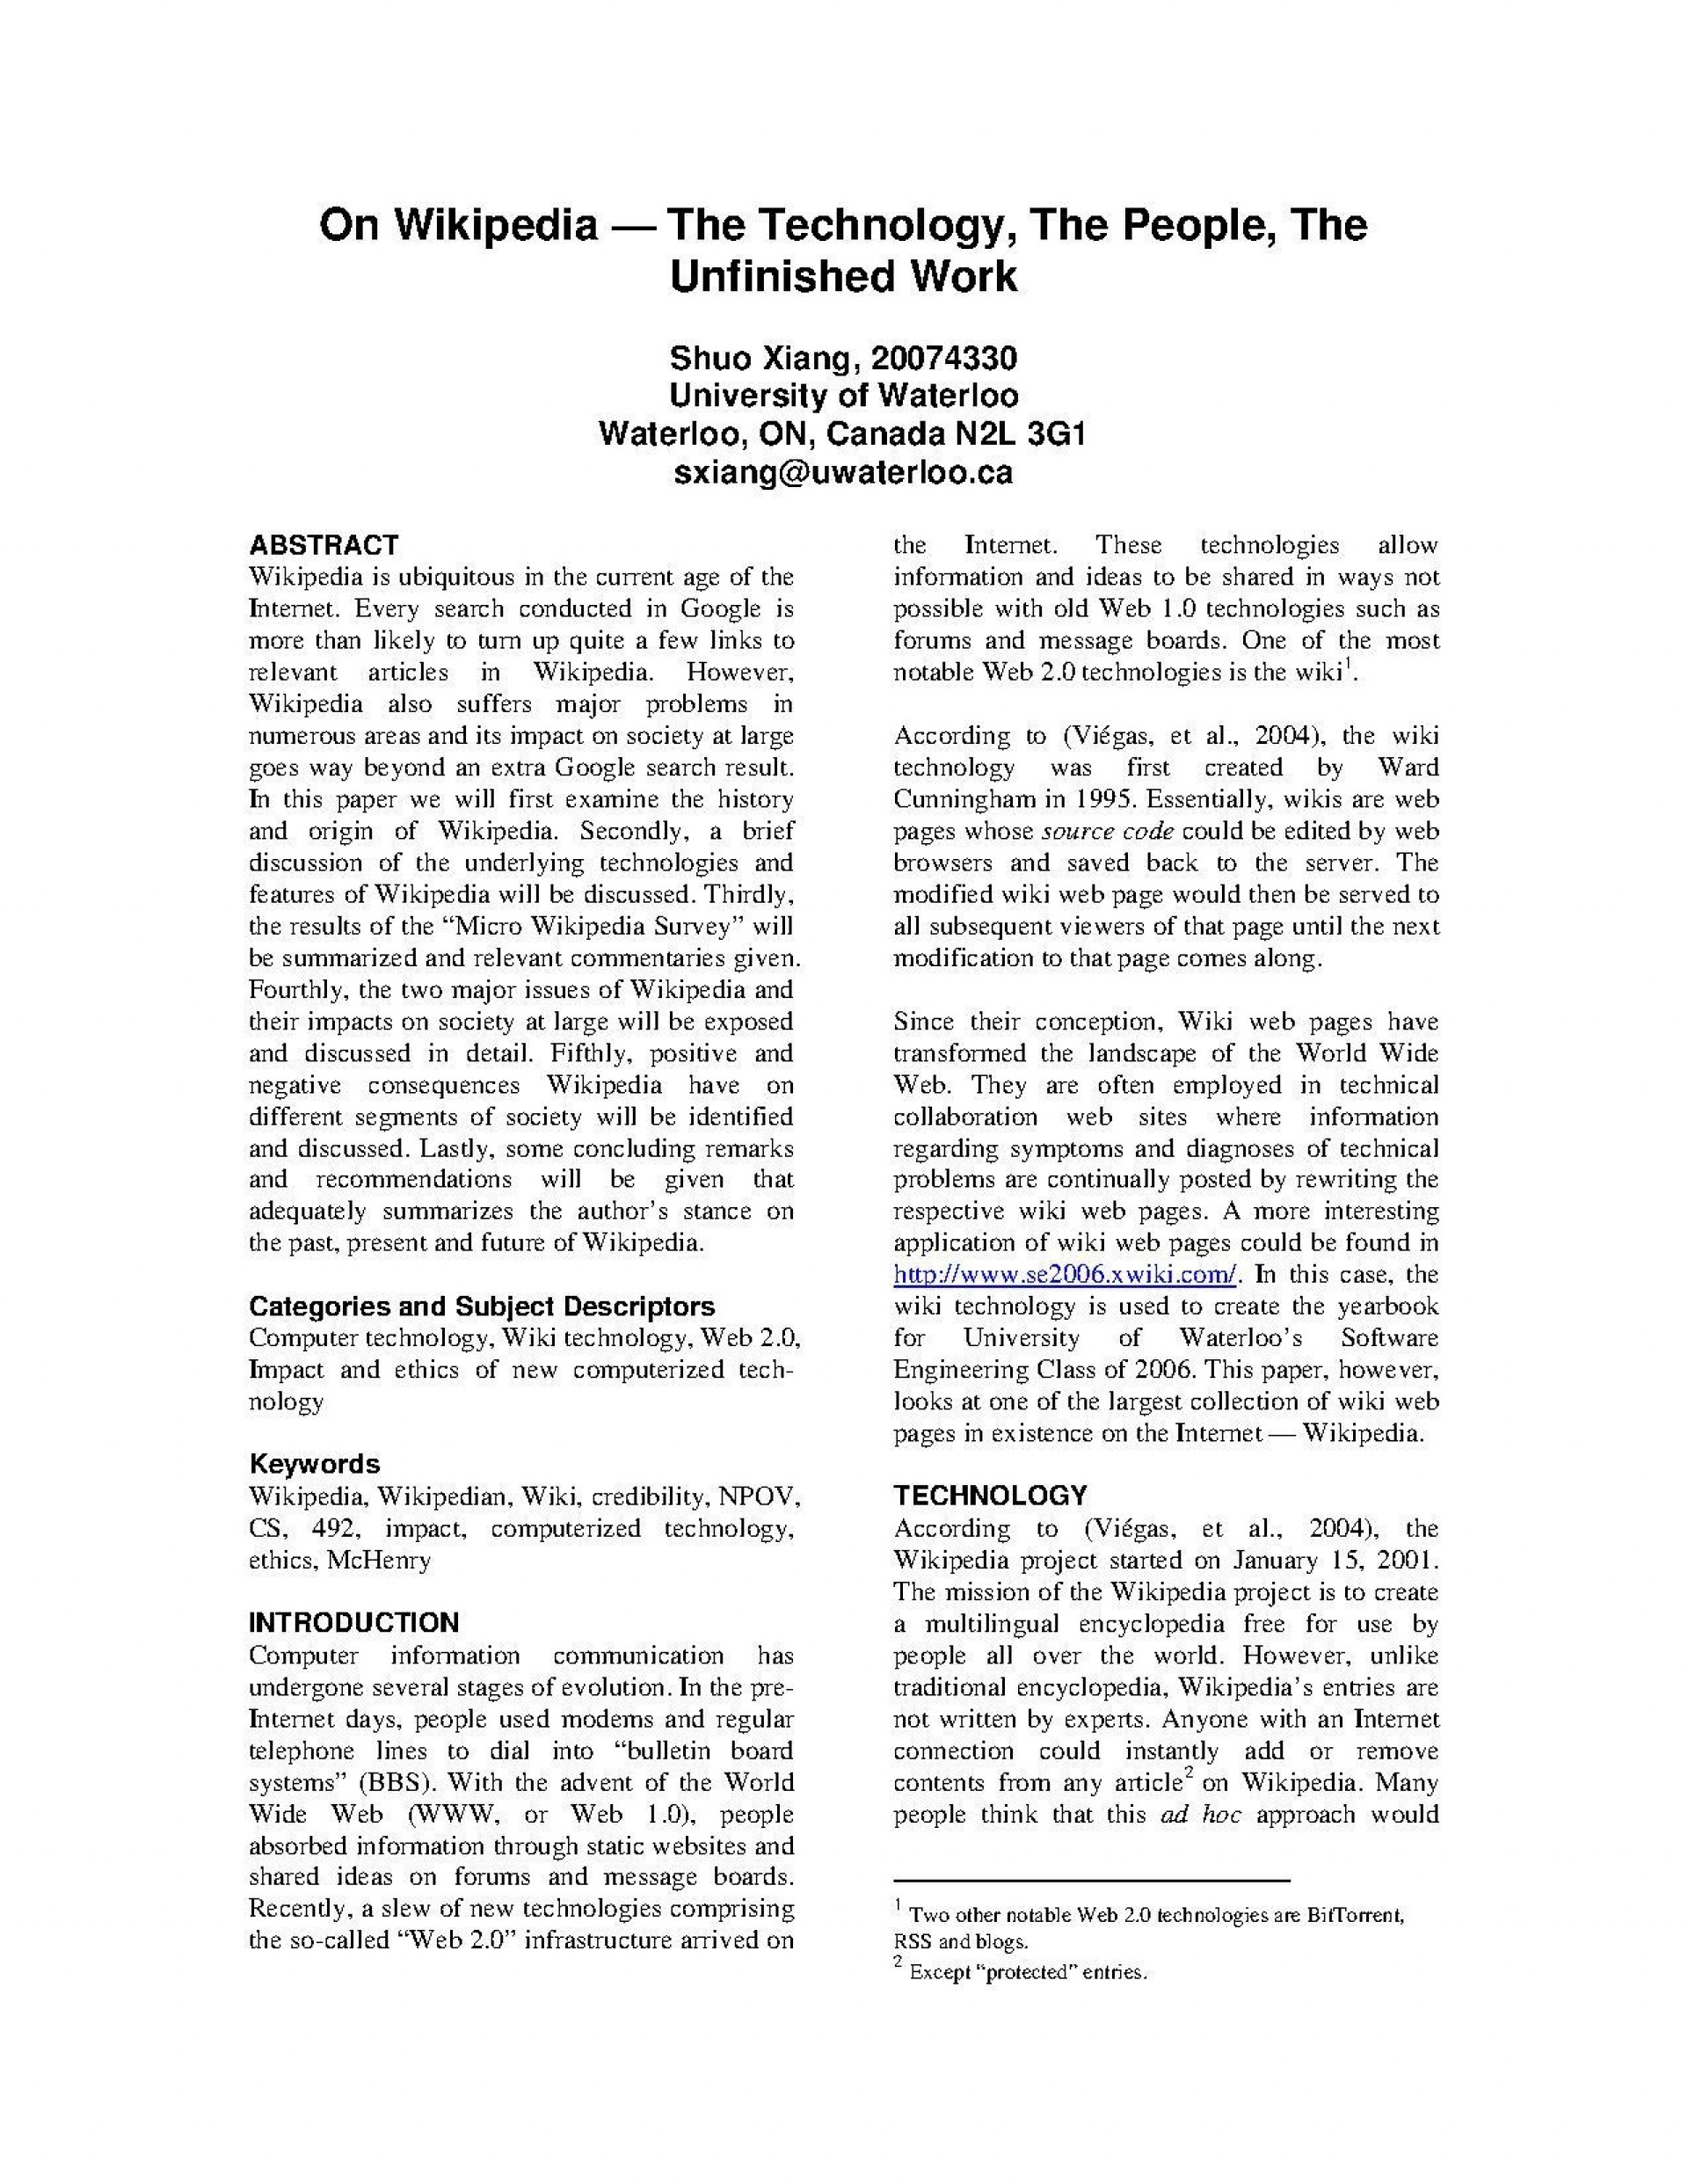 017 Essay Example Page1 1275px Shuo Xian Wikipedia Unbelievable Pdf Gujarati Free Download Argumentative Terrorism 1920